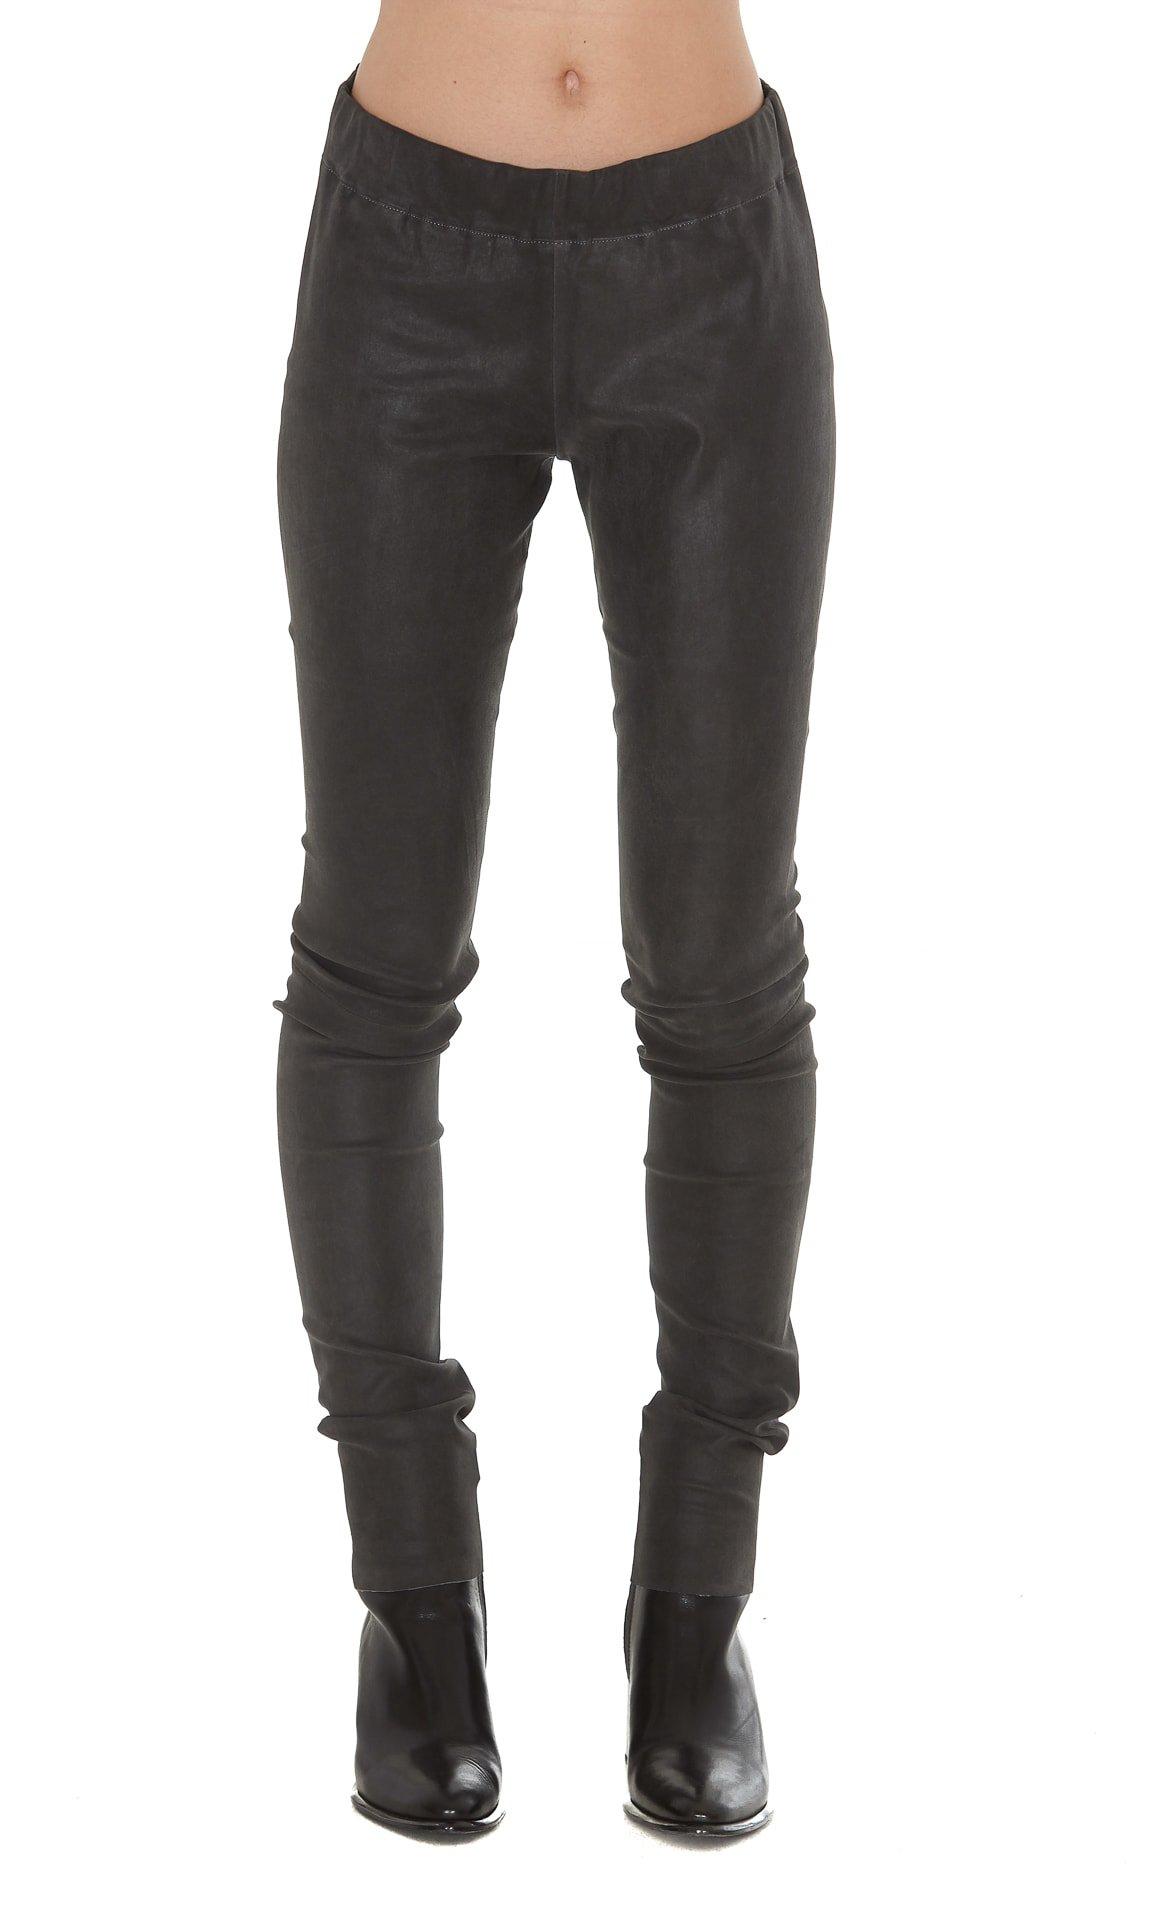 Sylvie Schimmel Fun Strecht Vintage Leather Trousers